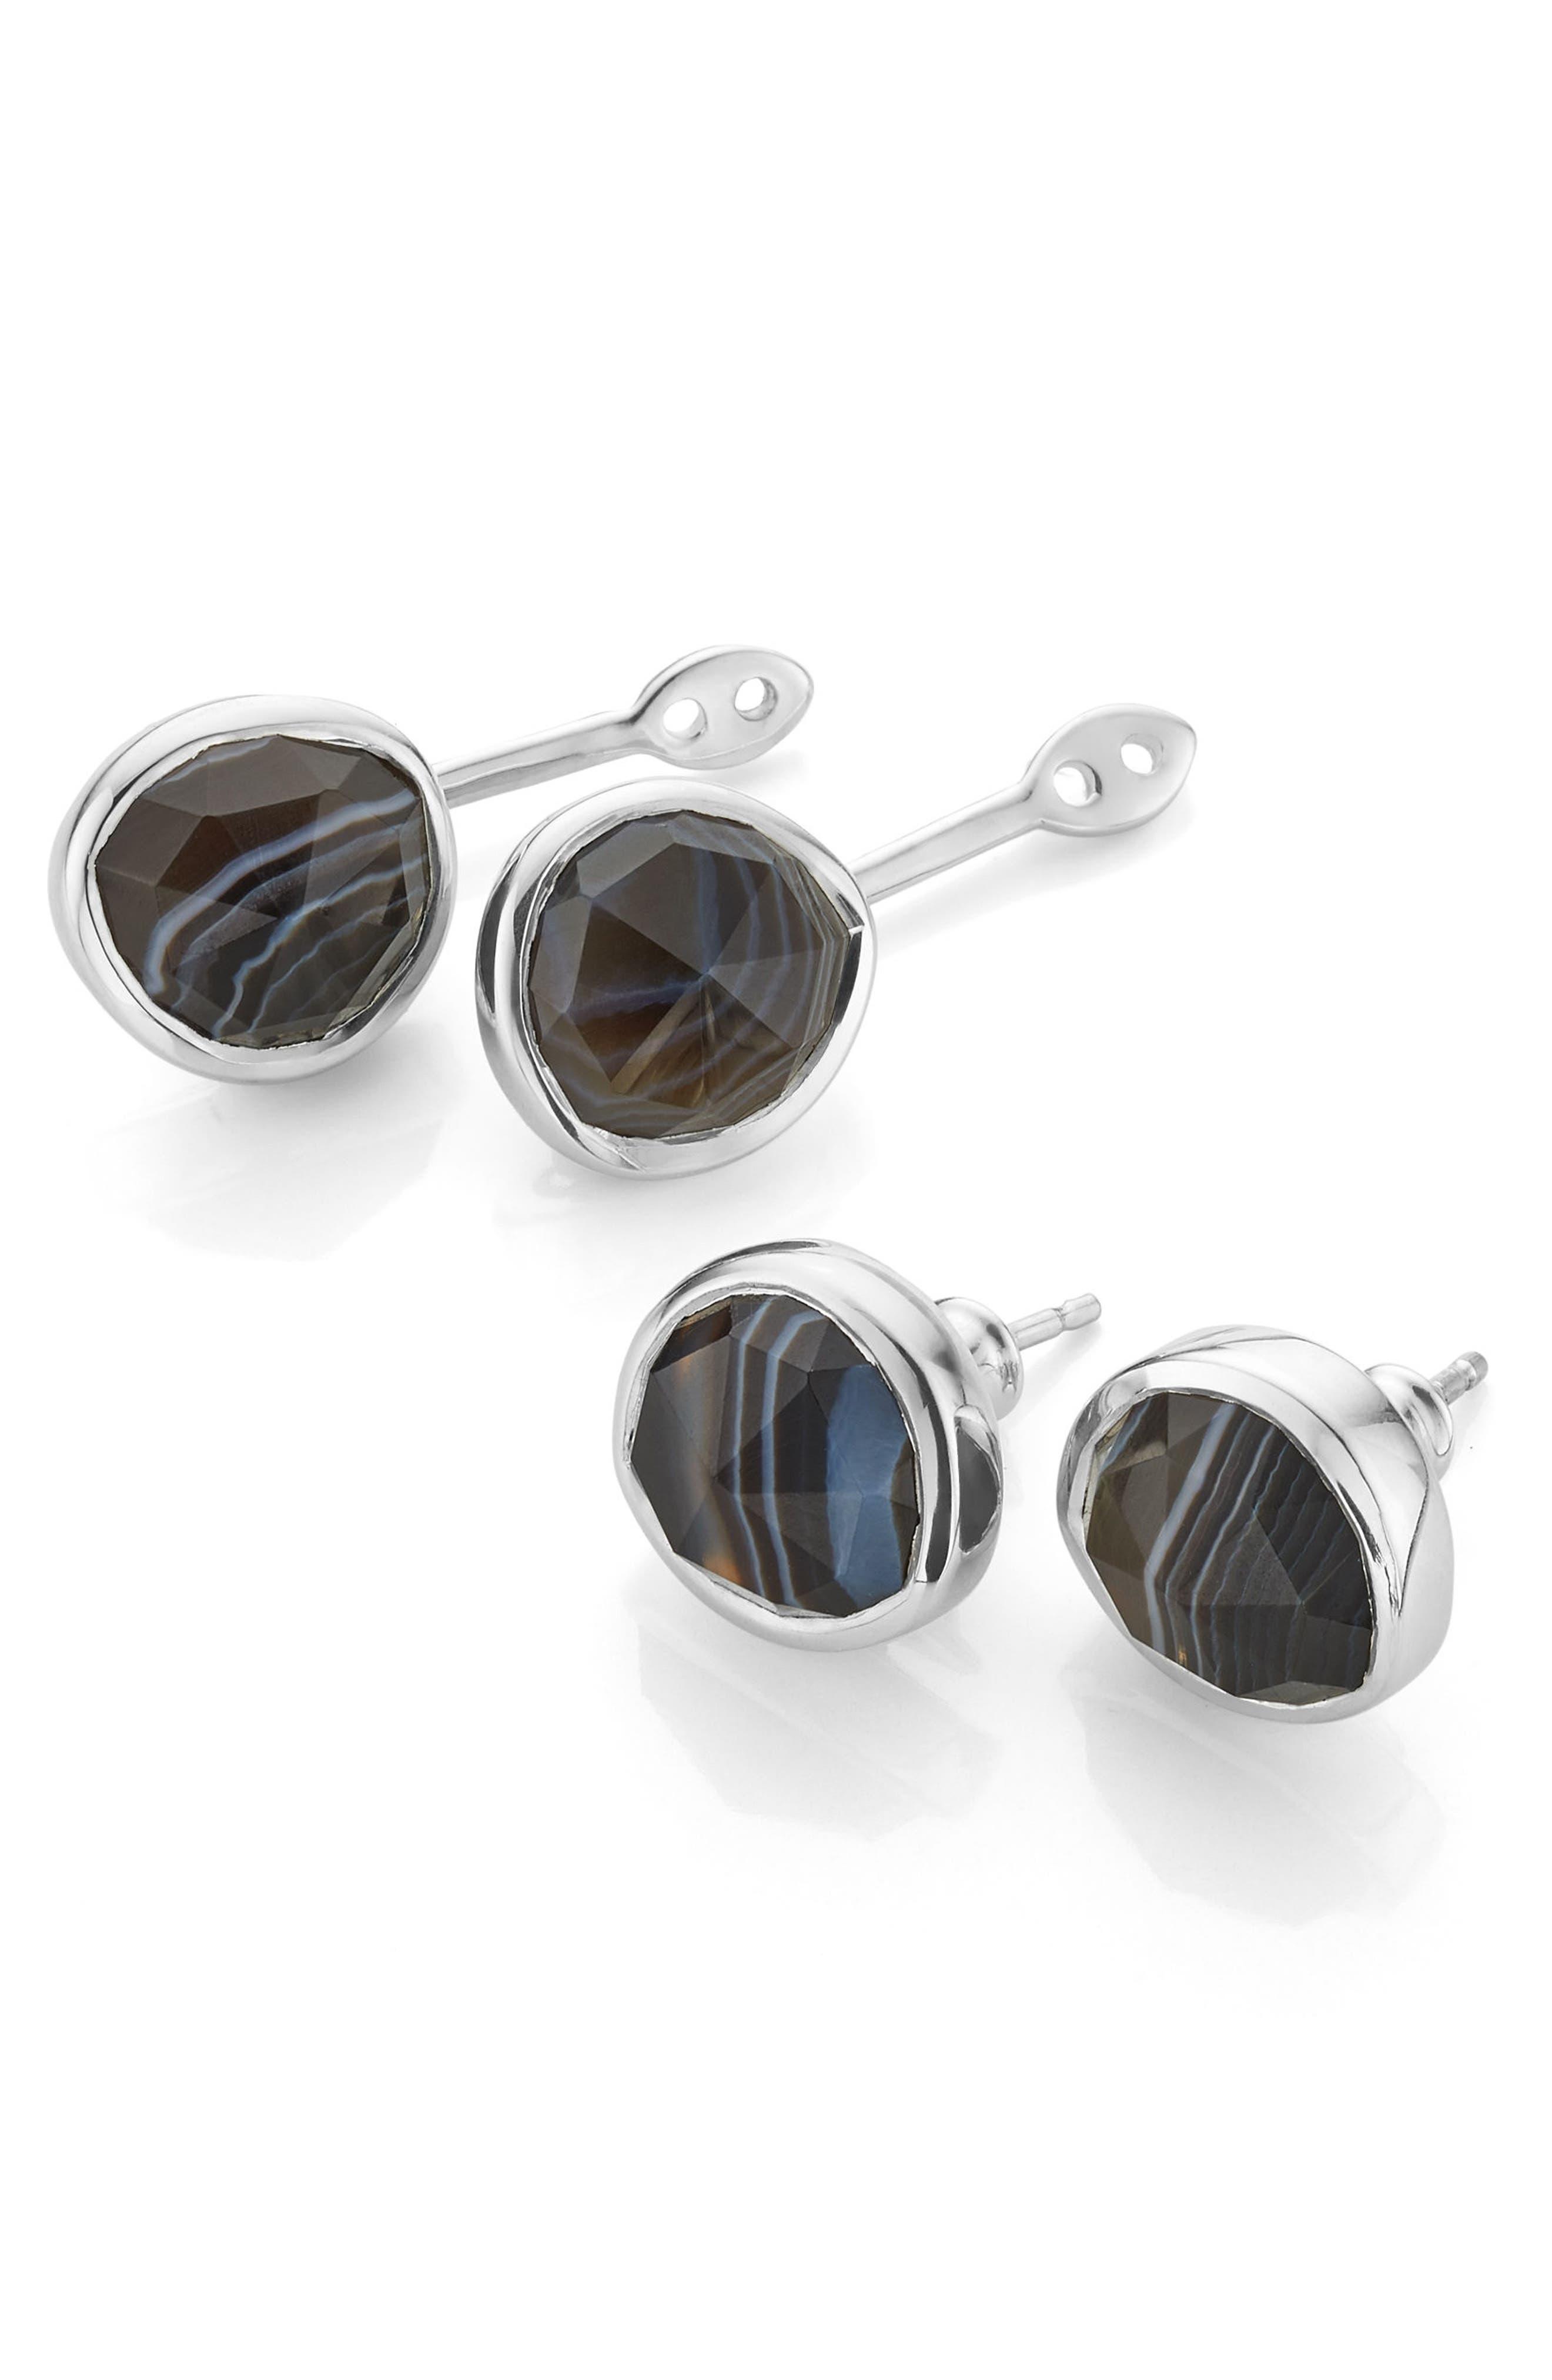 Siren Semiprecious Stone Ear Jackets,                         Main,                         color, Silver/ Black Line Onyx